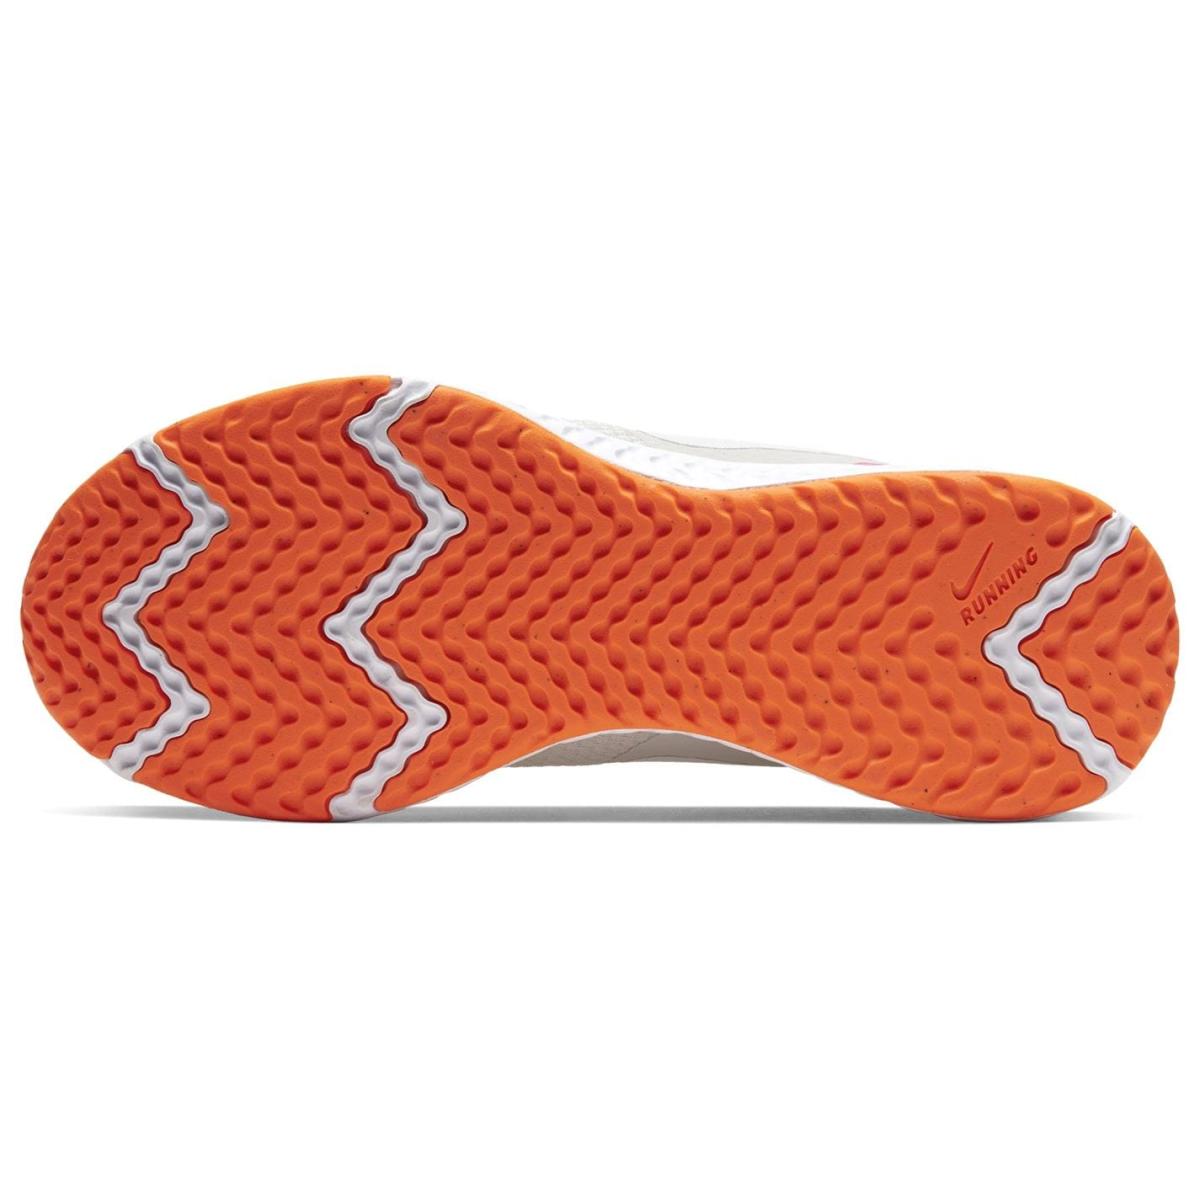 Nike-Revolution-Turnschuhe-Damen-Sneaker-Sportschuhe-Laufschuhe-1160 Indexbild 35